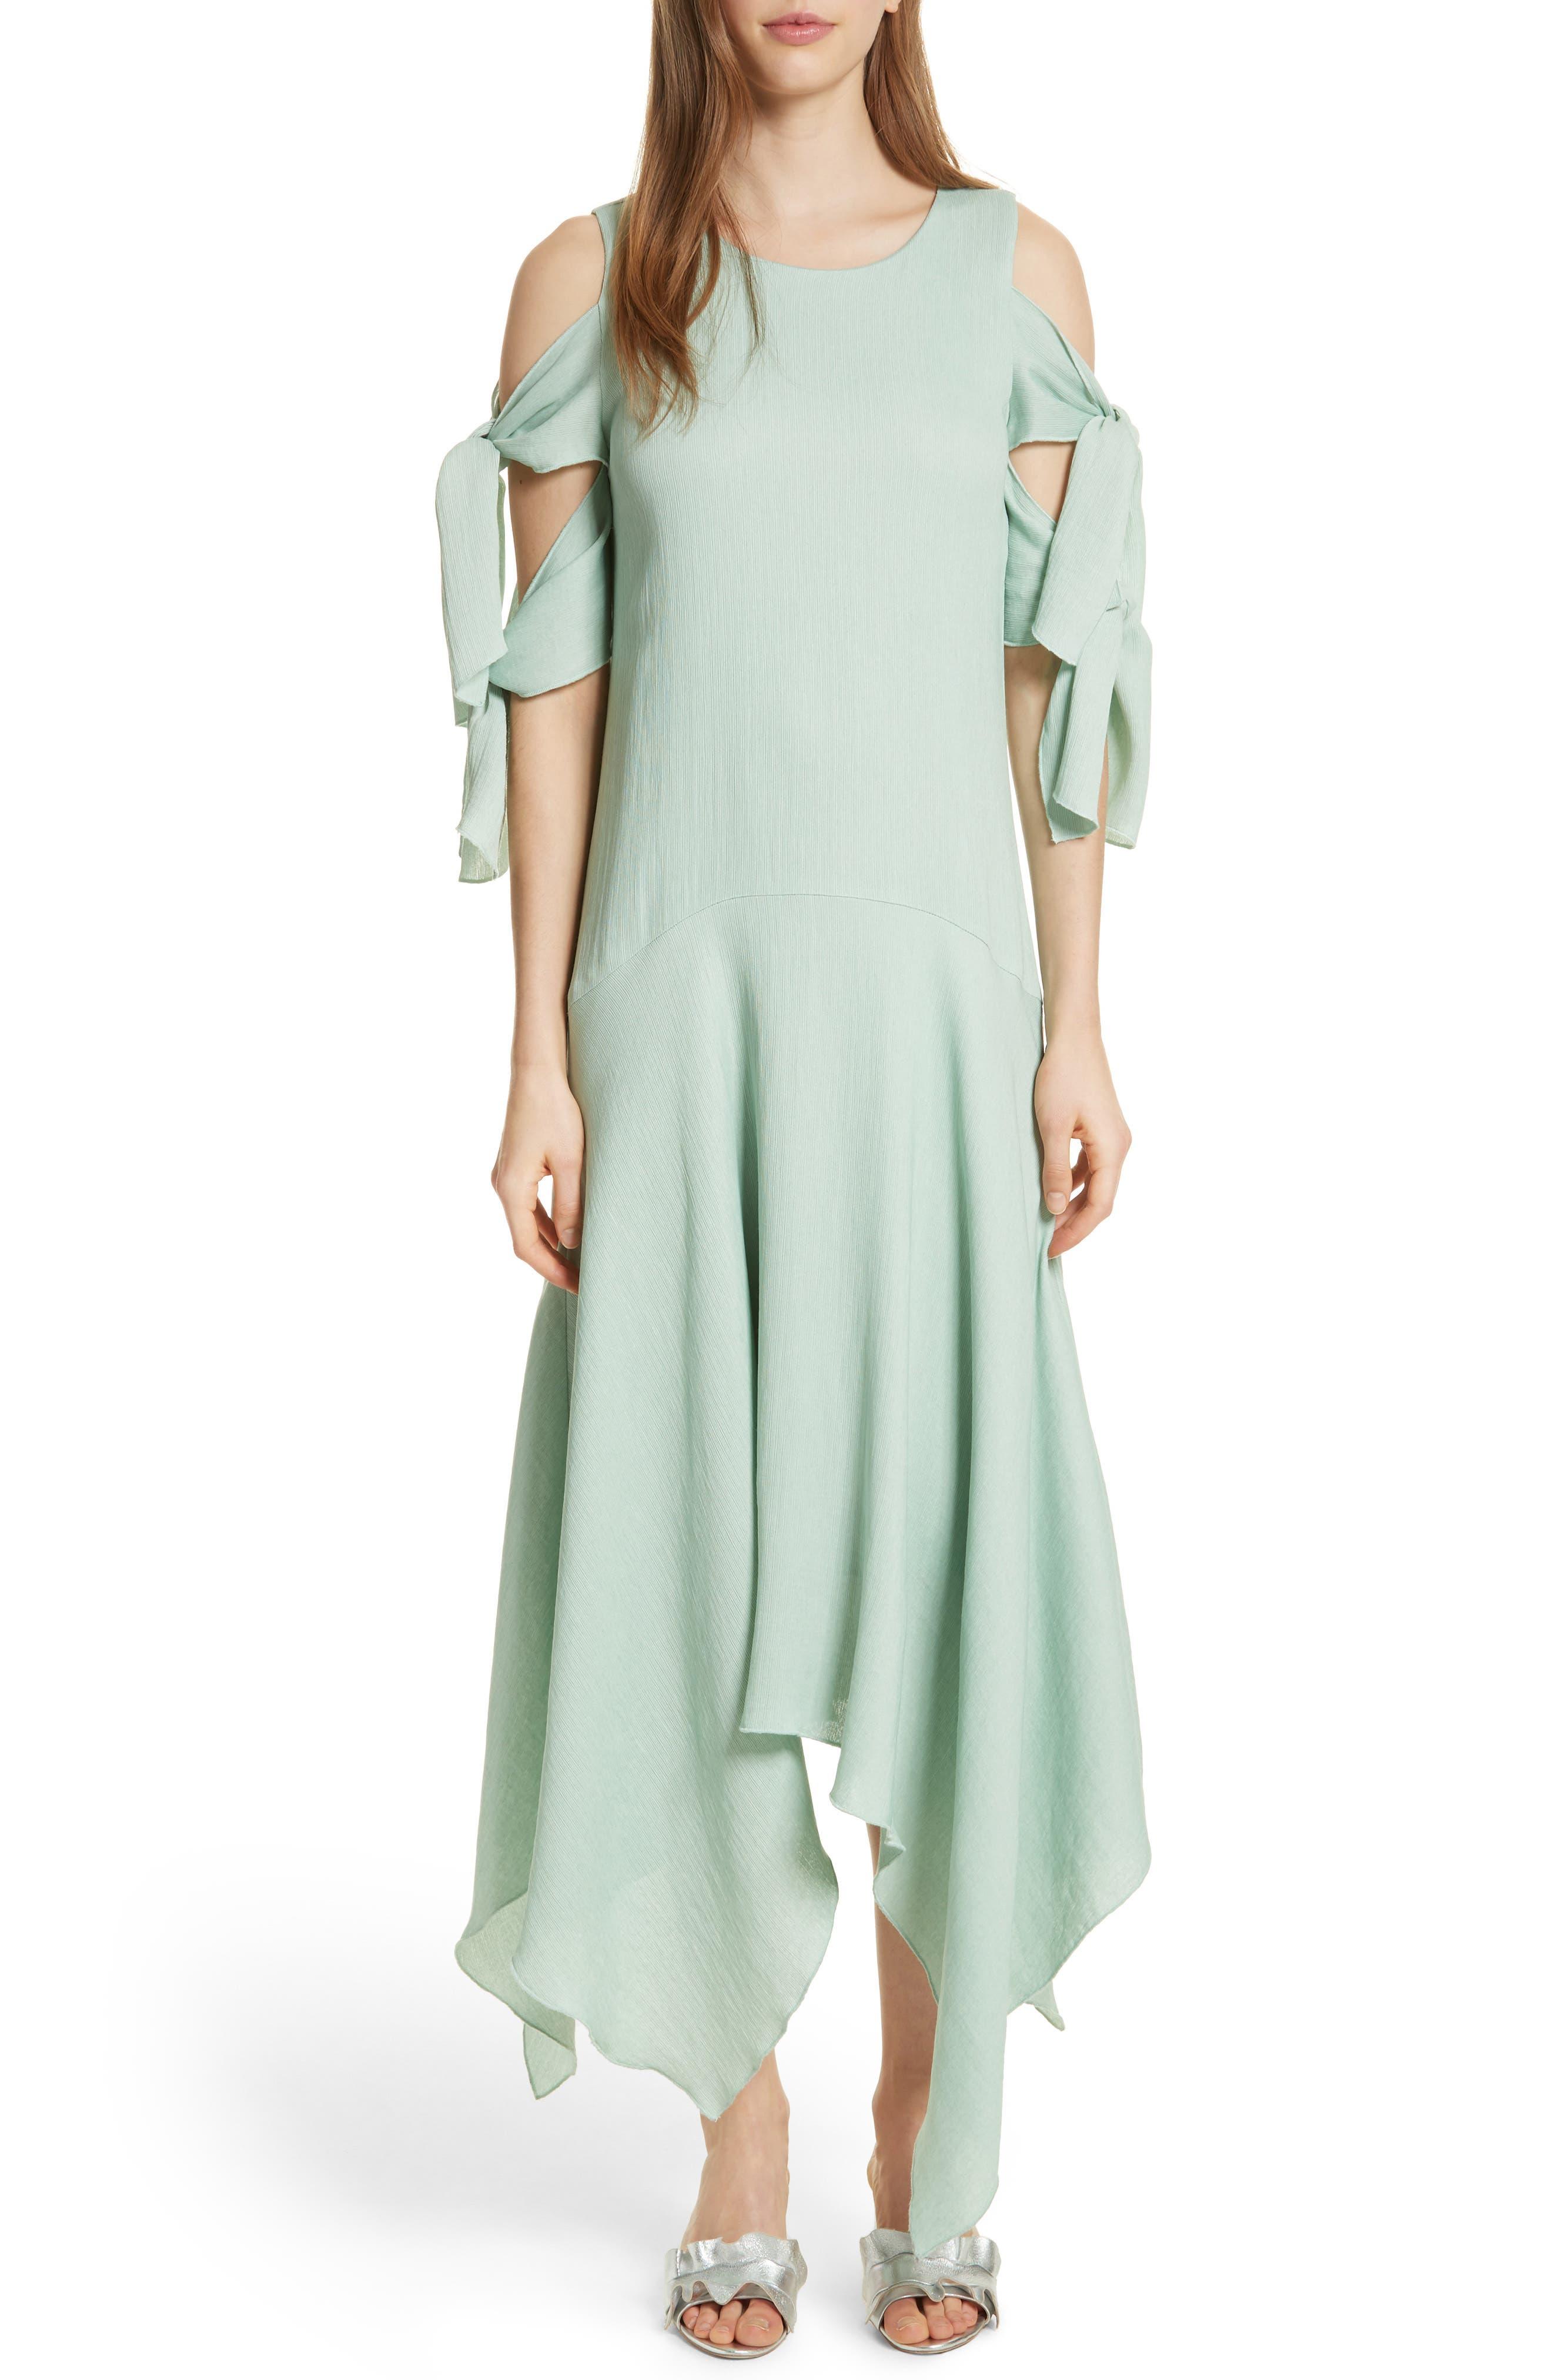 Prose & Poetry Vivianna Drop Waist Midi Dress,                         Main,                         color, 332